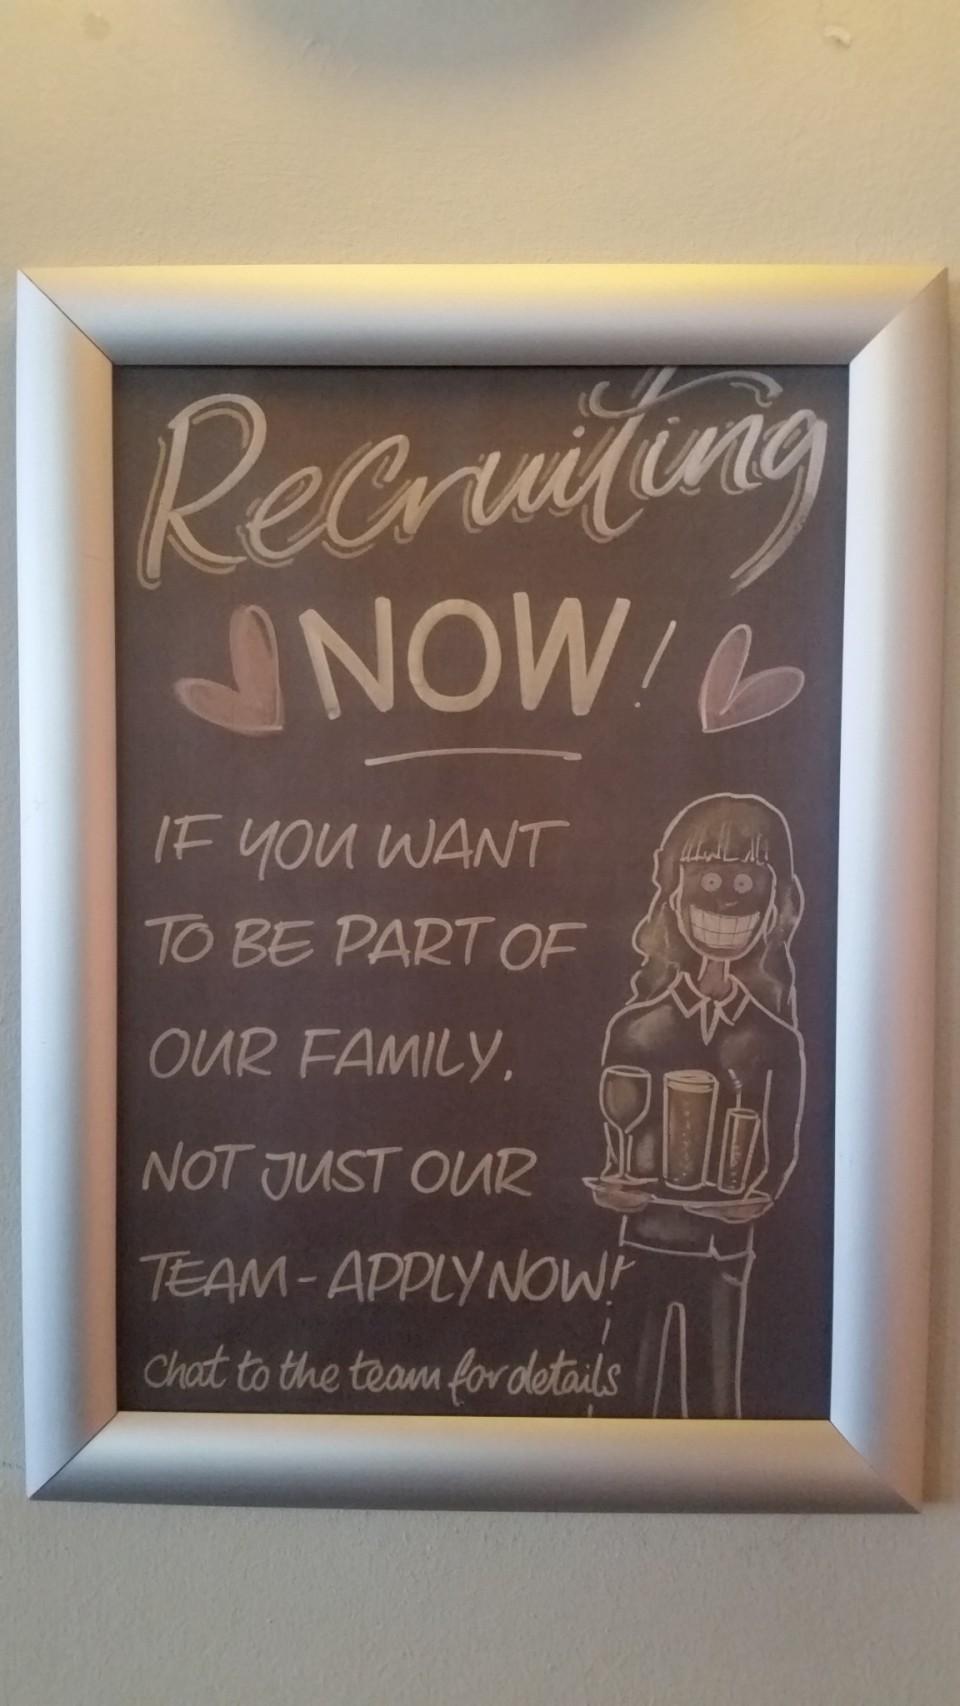 Airbaloon Pub Horley angajeaza in caz ca intereseaza pe cineva.